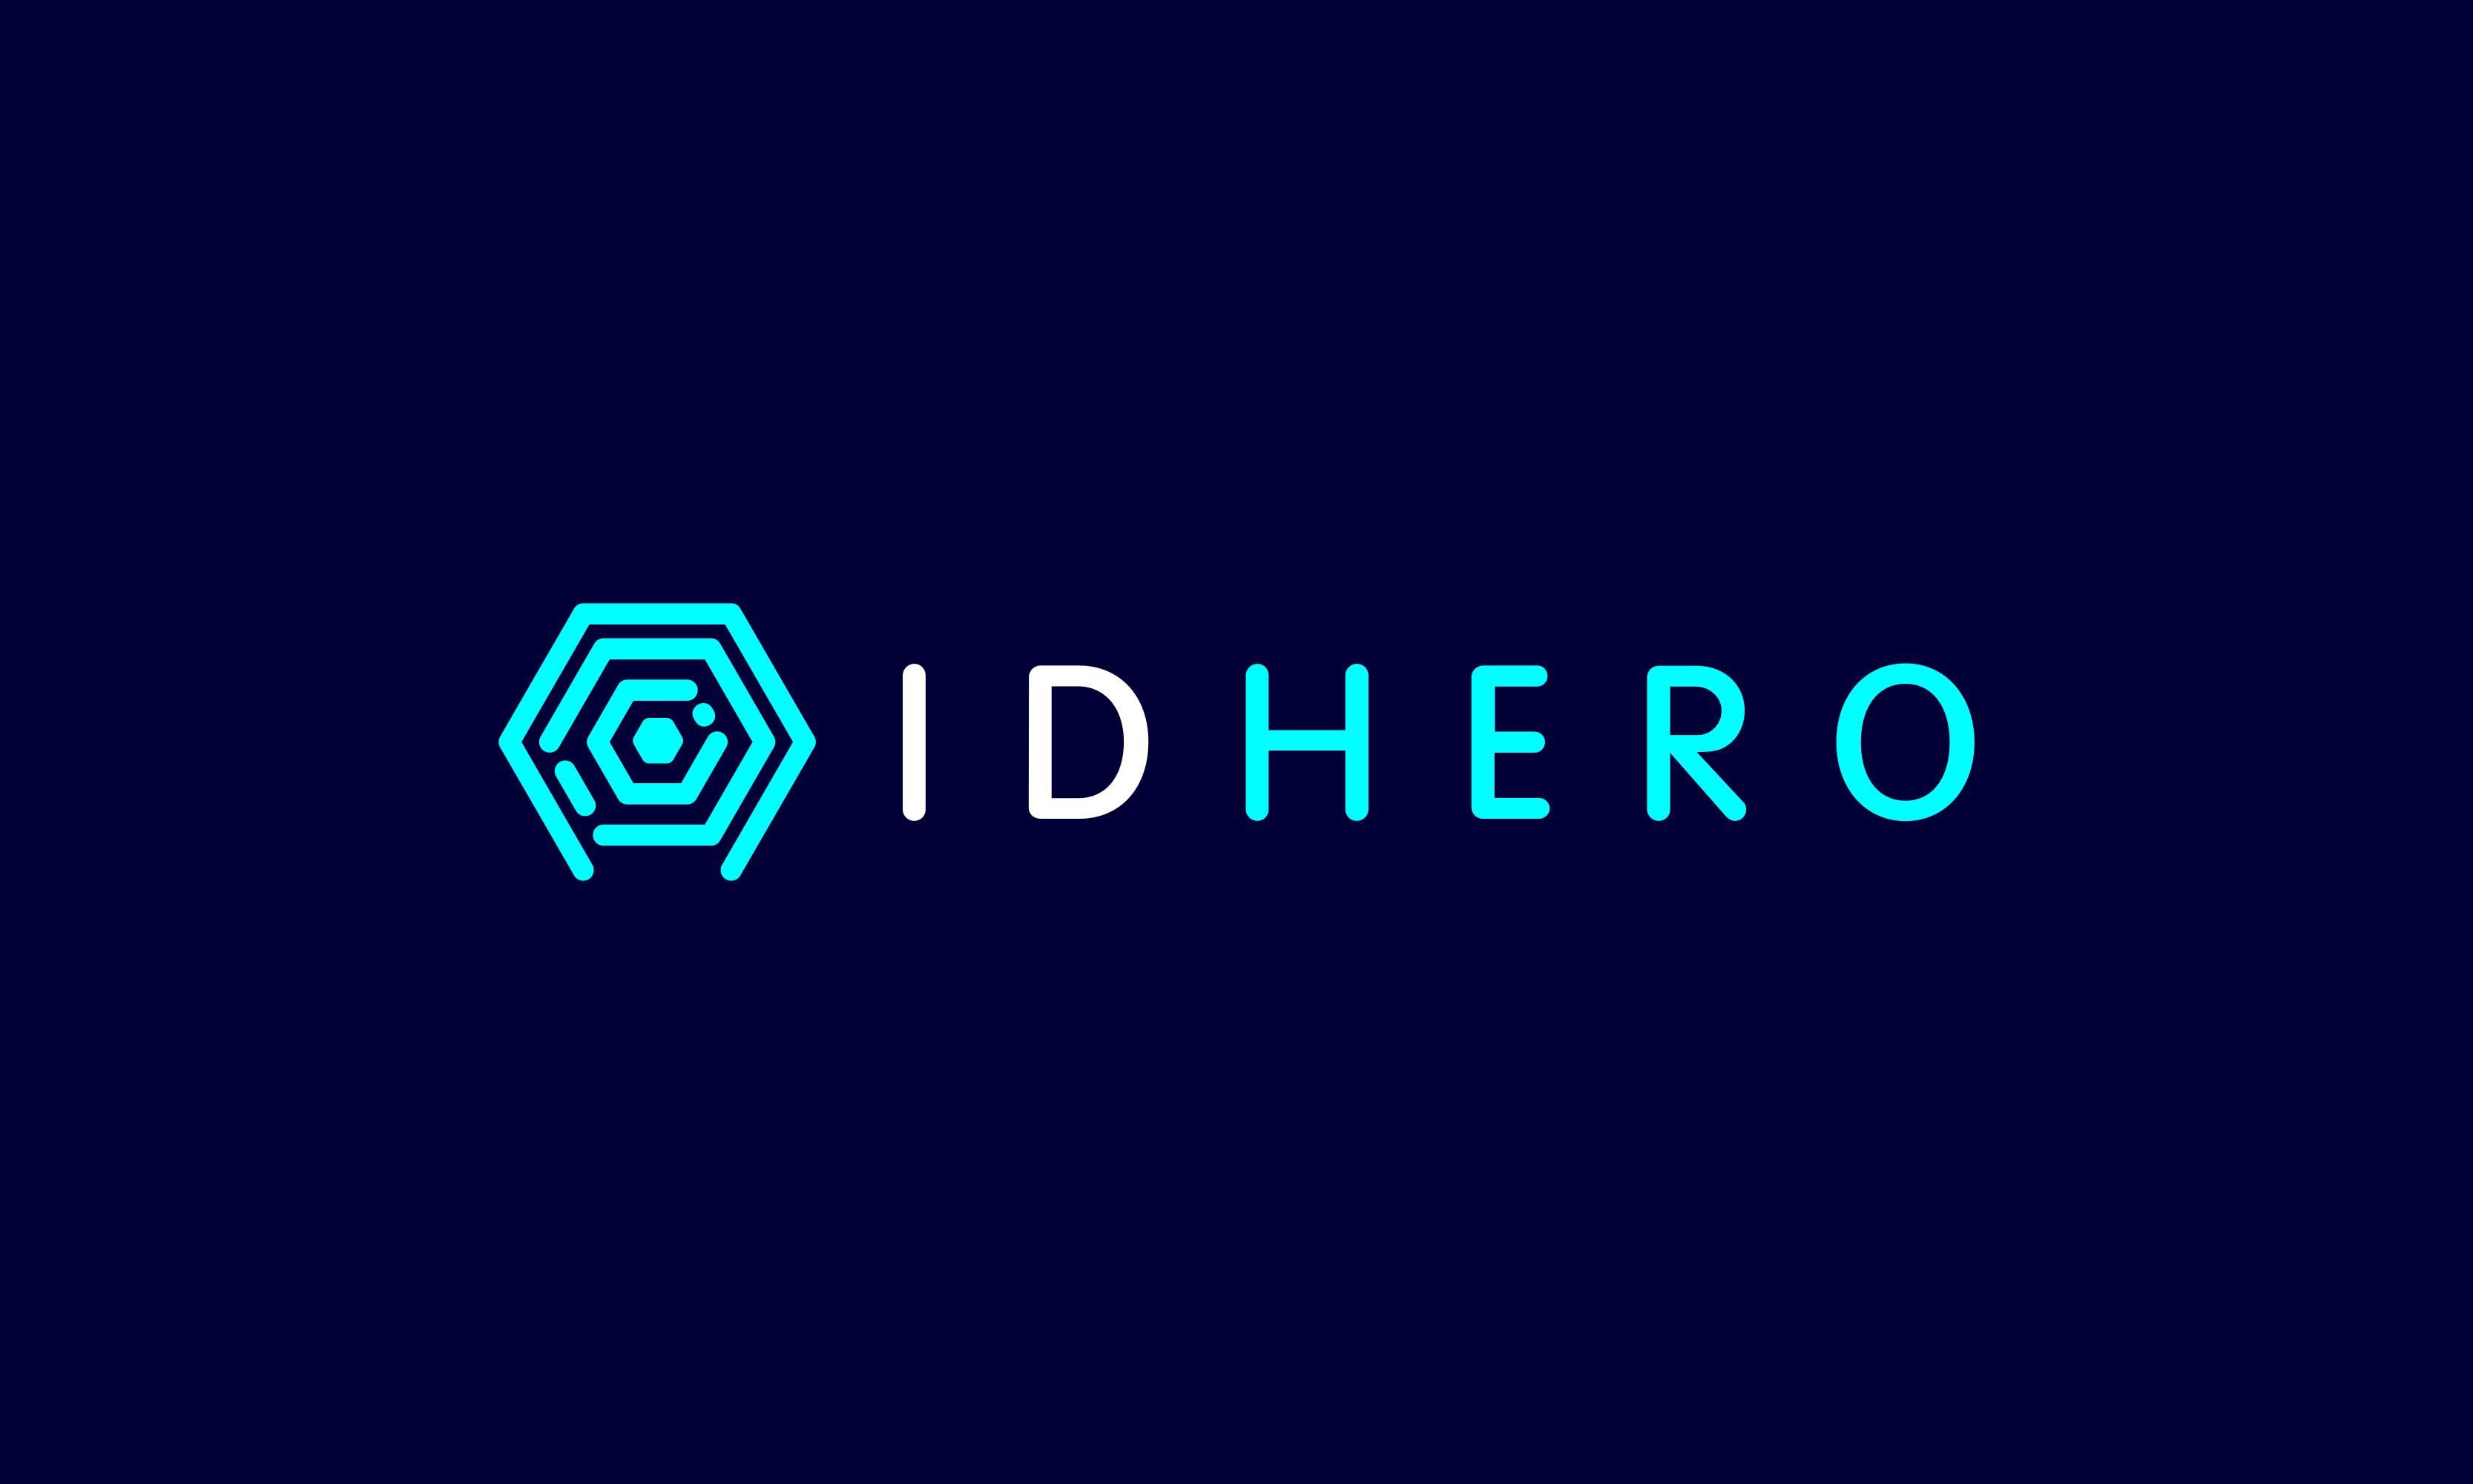 IDHero